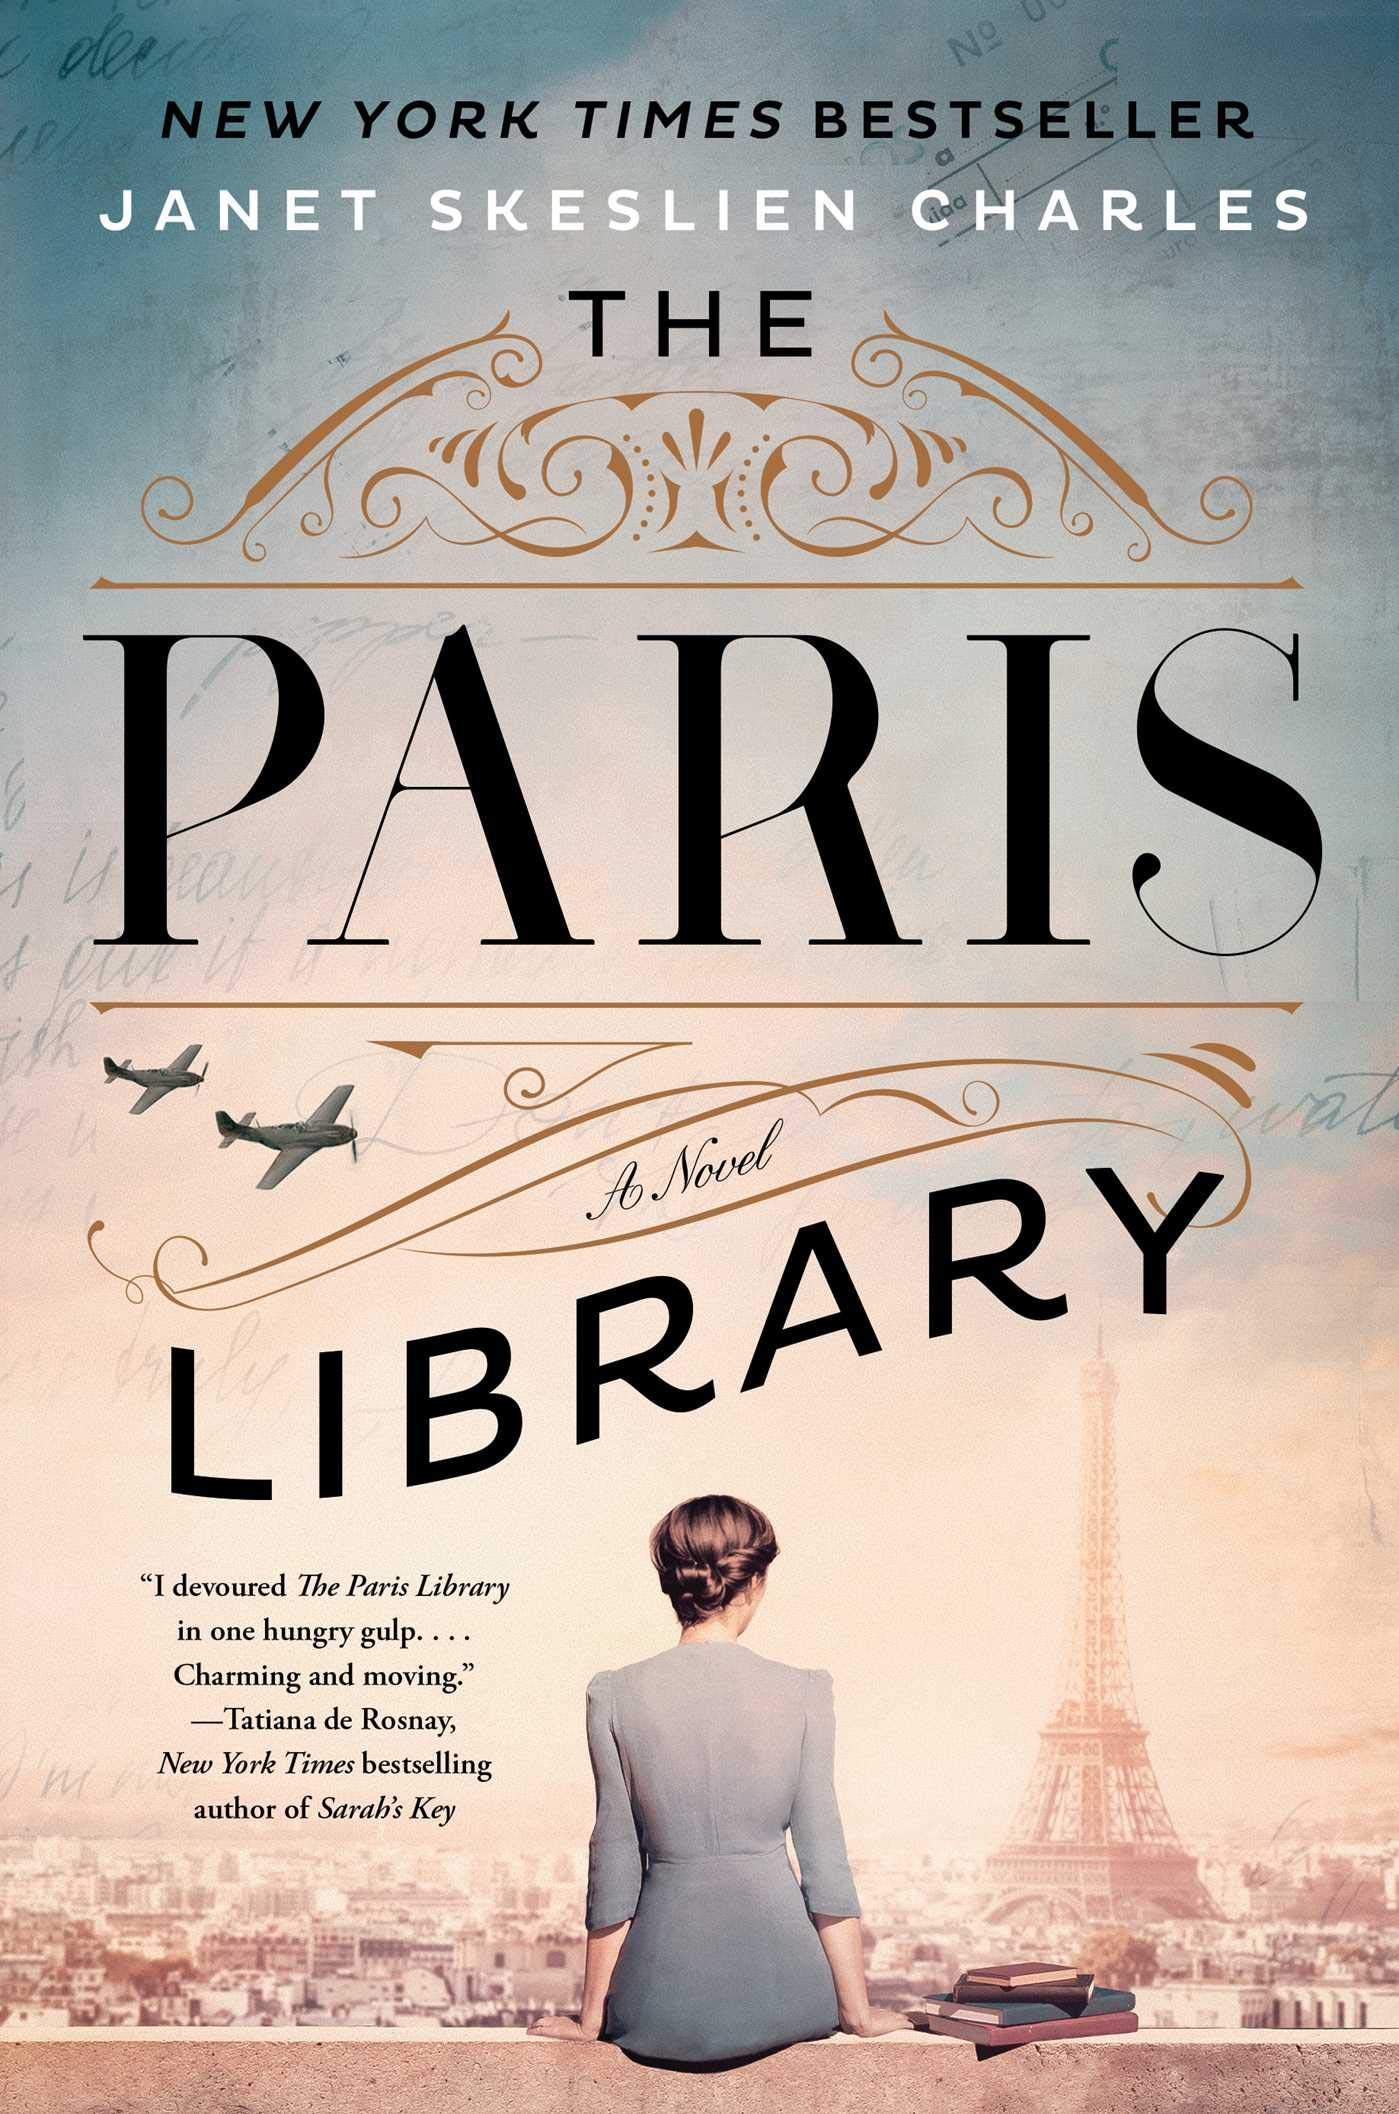 Amazon.com: The Paris Library: A Novel (9781982134198): Charles, Janet  Skeslien: Books